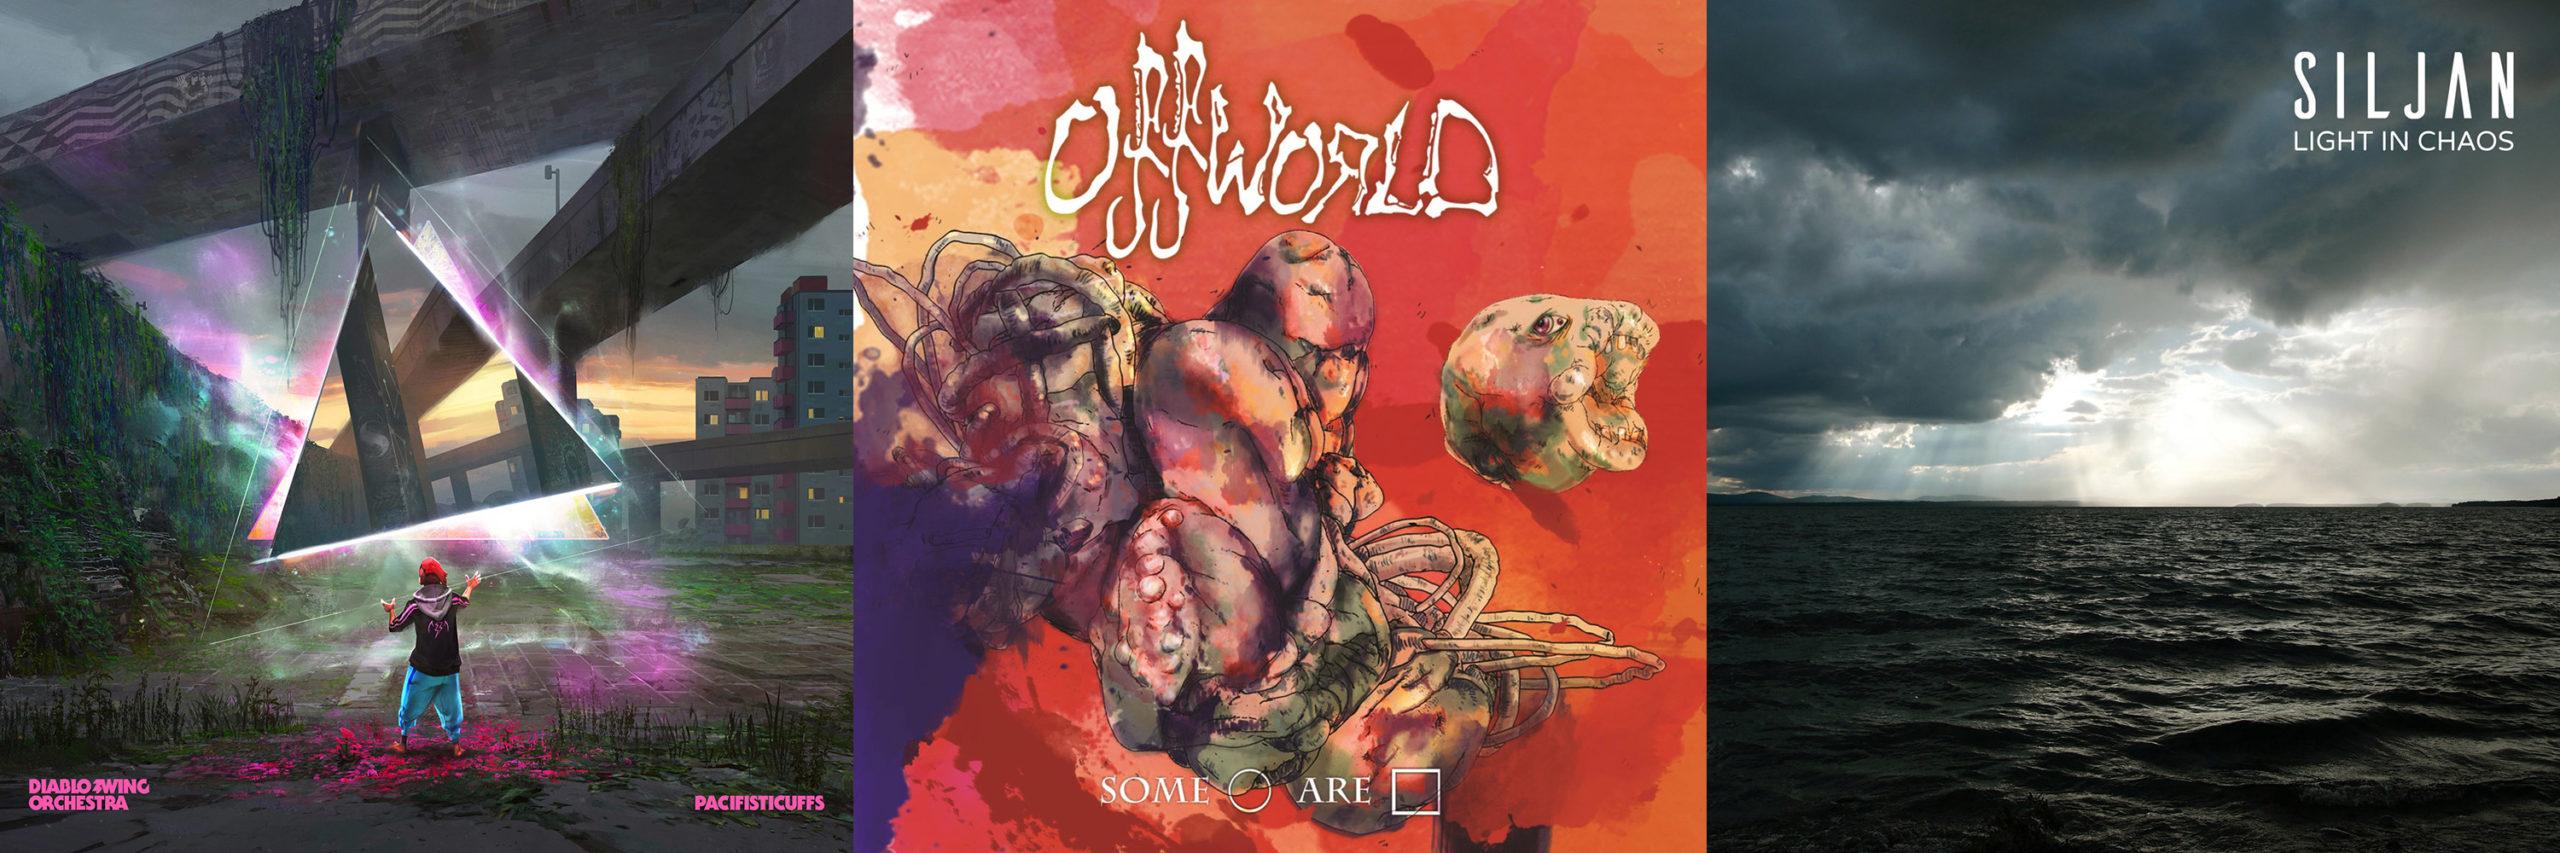 Diablo Swing Orchestra / Offworld / Siljan